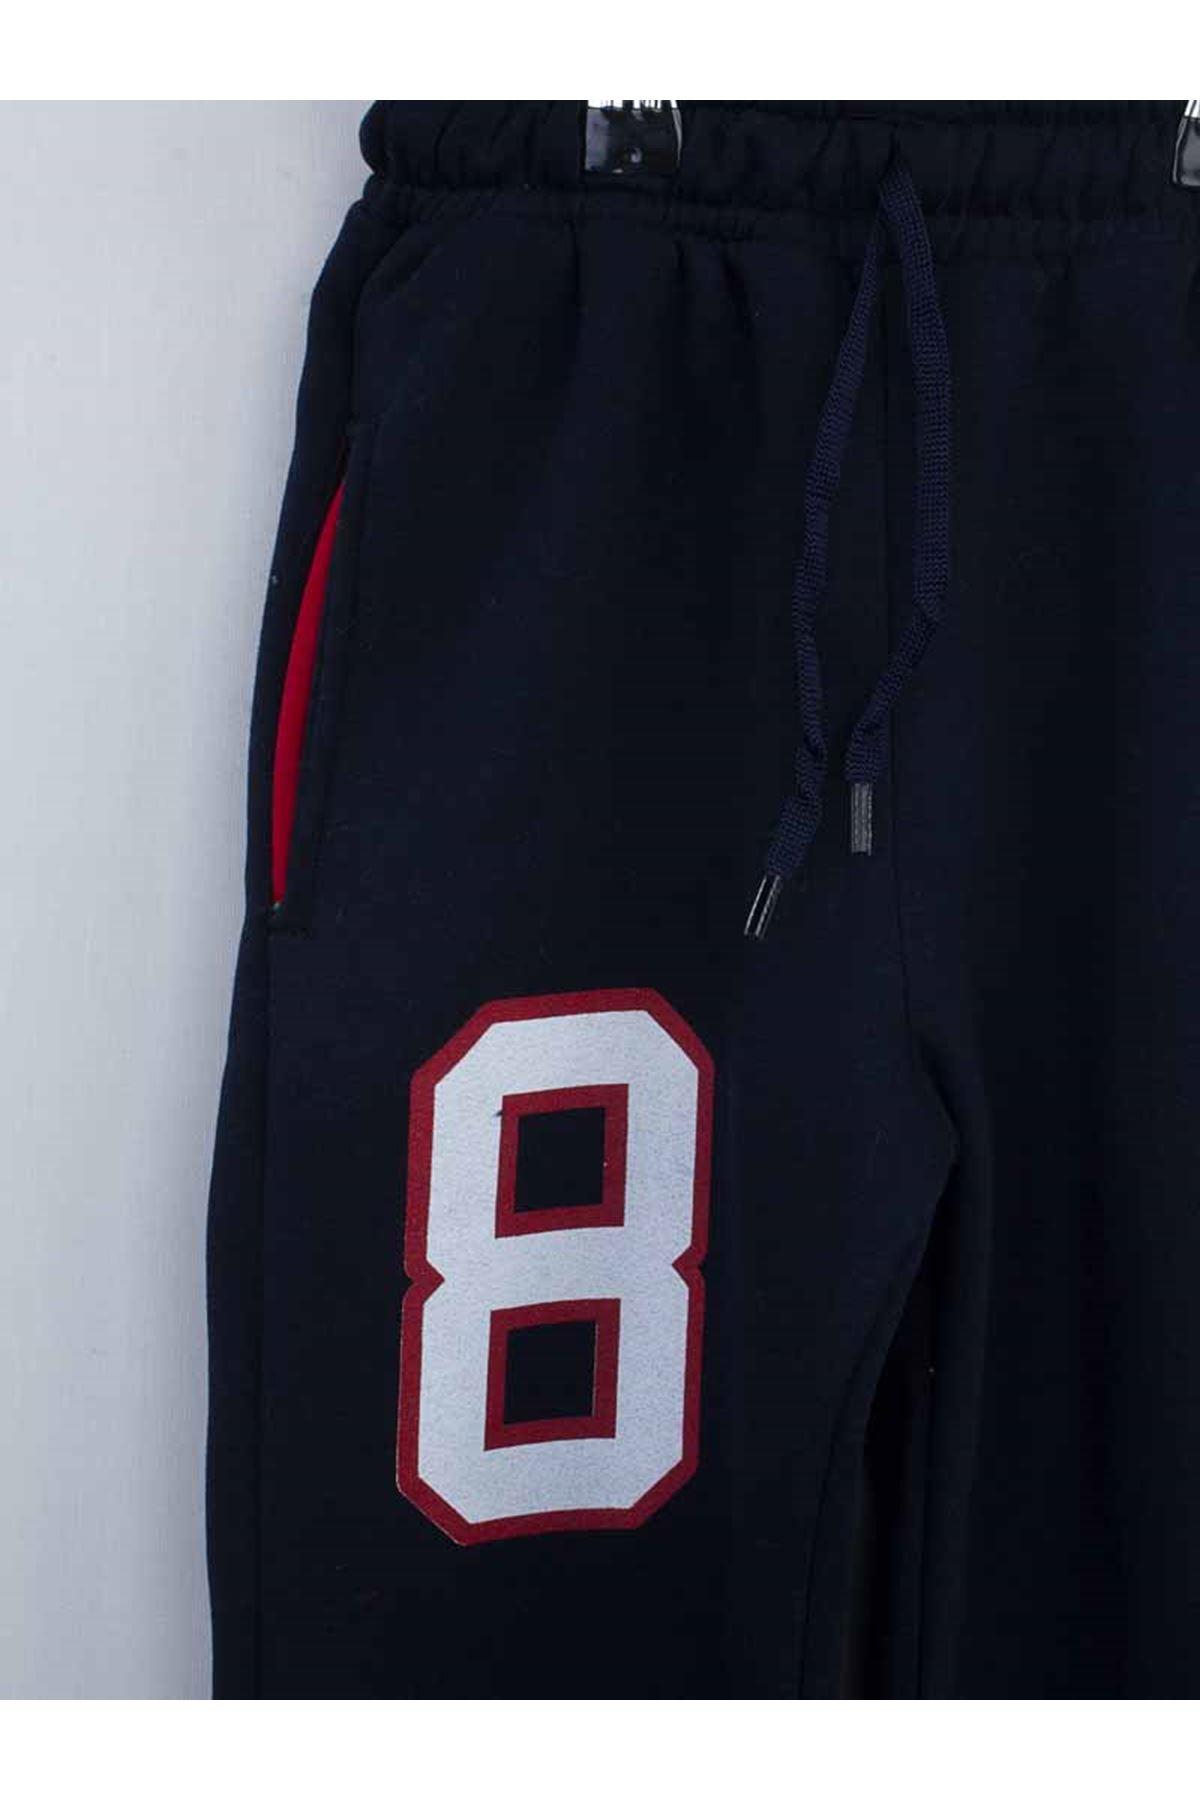 Red Burgundy boys tracksuit set bottom sweatpants sweat top 2 piece cotton seasonal suits models